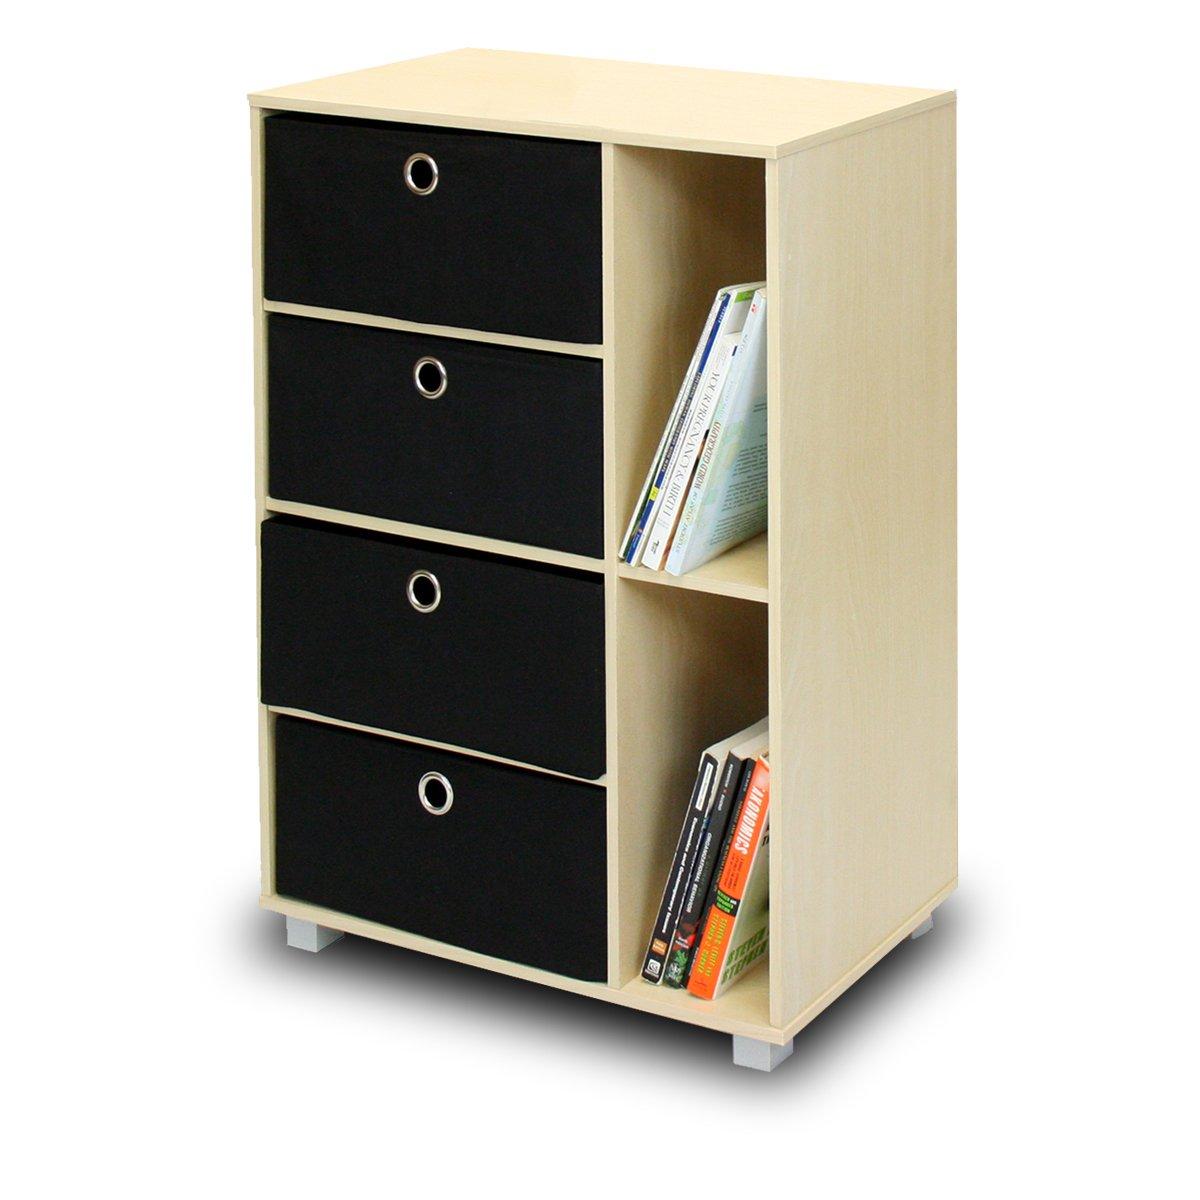 Furinno 11159SBE/BK Multipurpose Storage Cabinet w/4 Bin Drawers, Steam Beech/Black